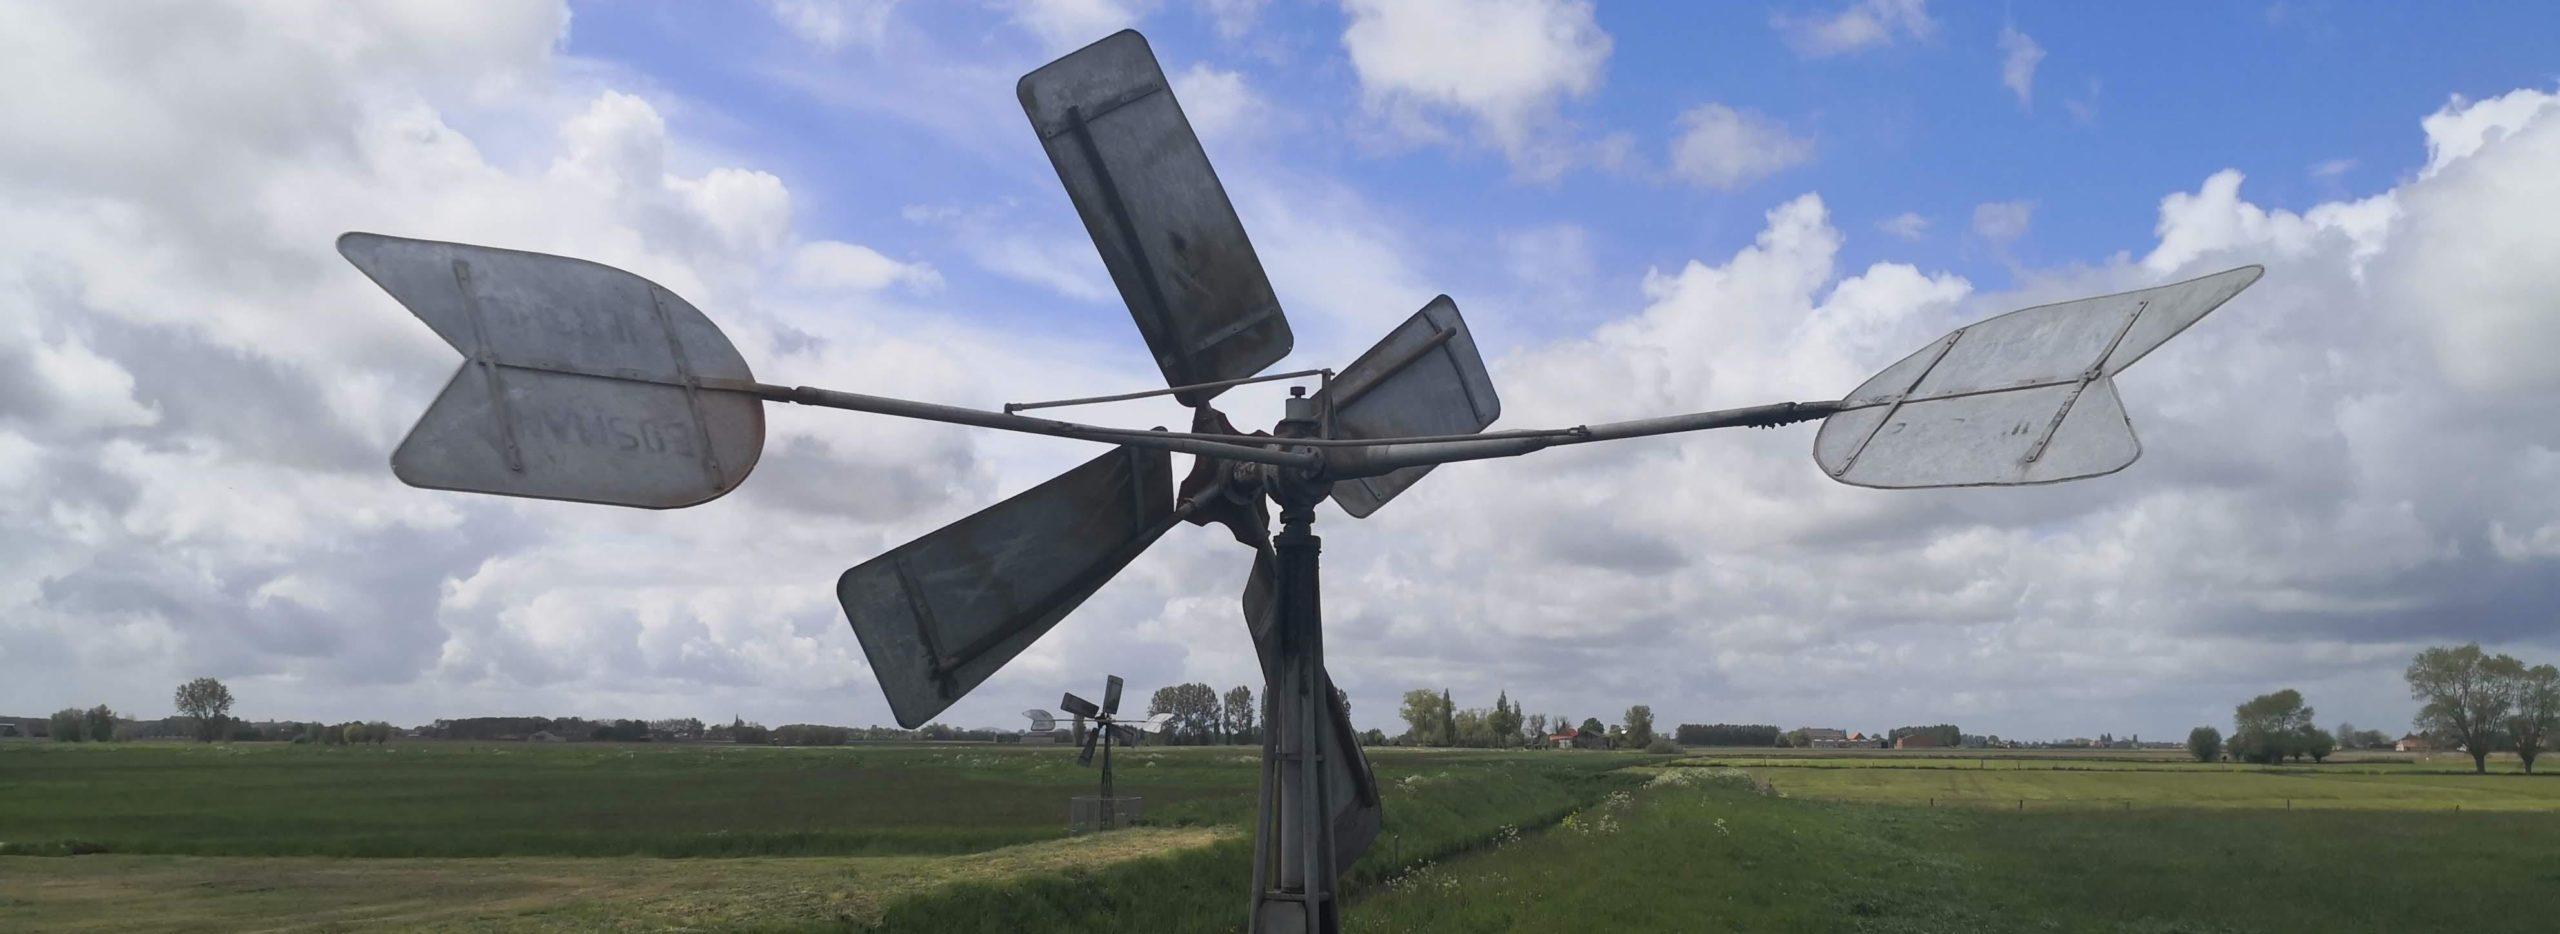 Oostvleteren éolienne